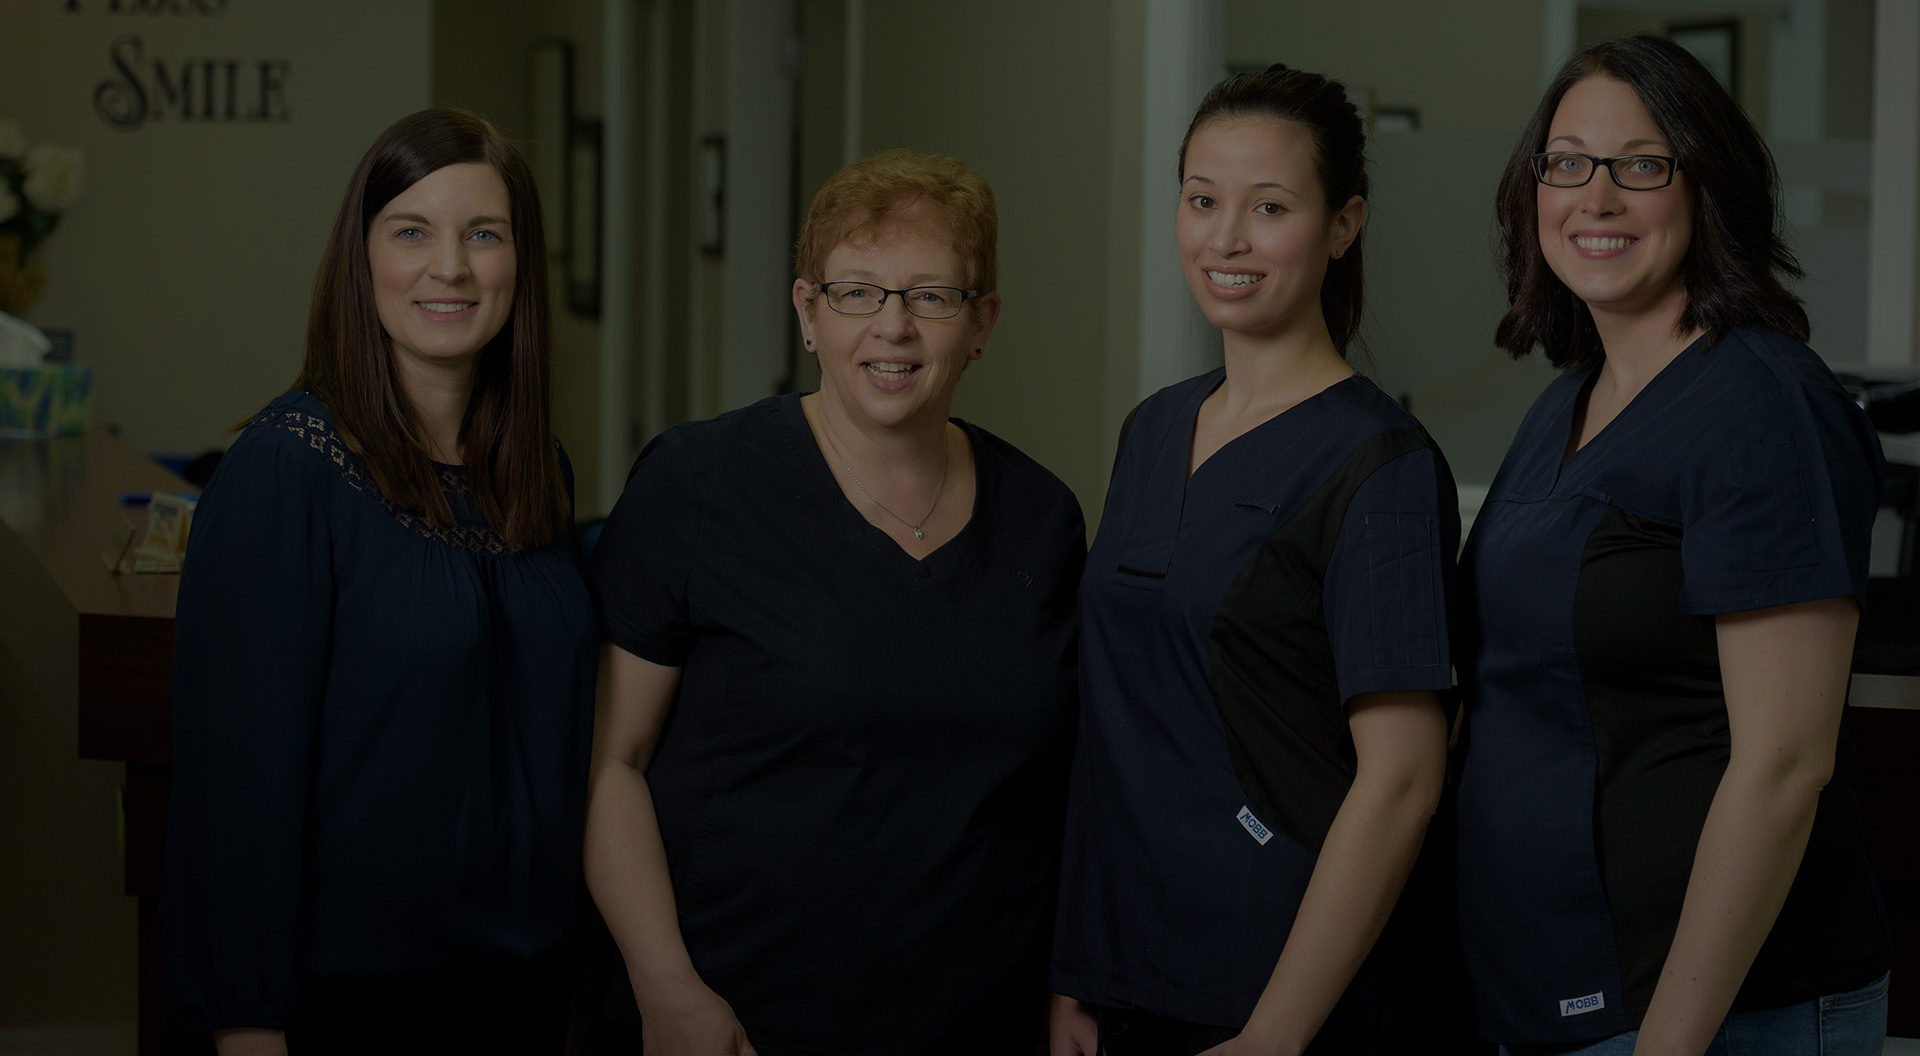 alliance-dental-new-glasgow-assistants